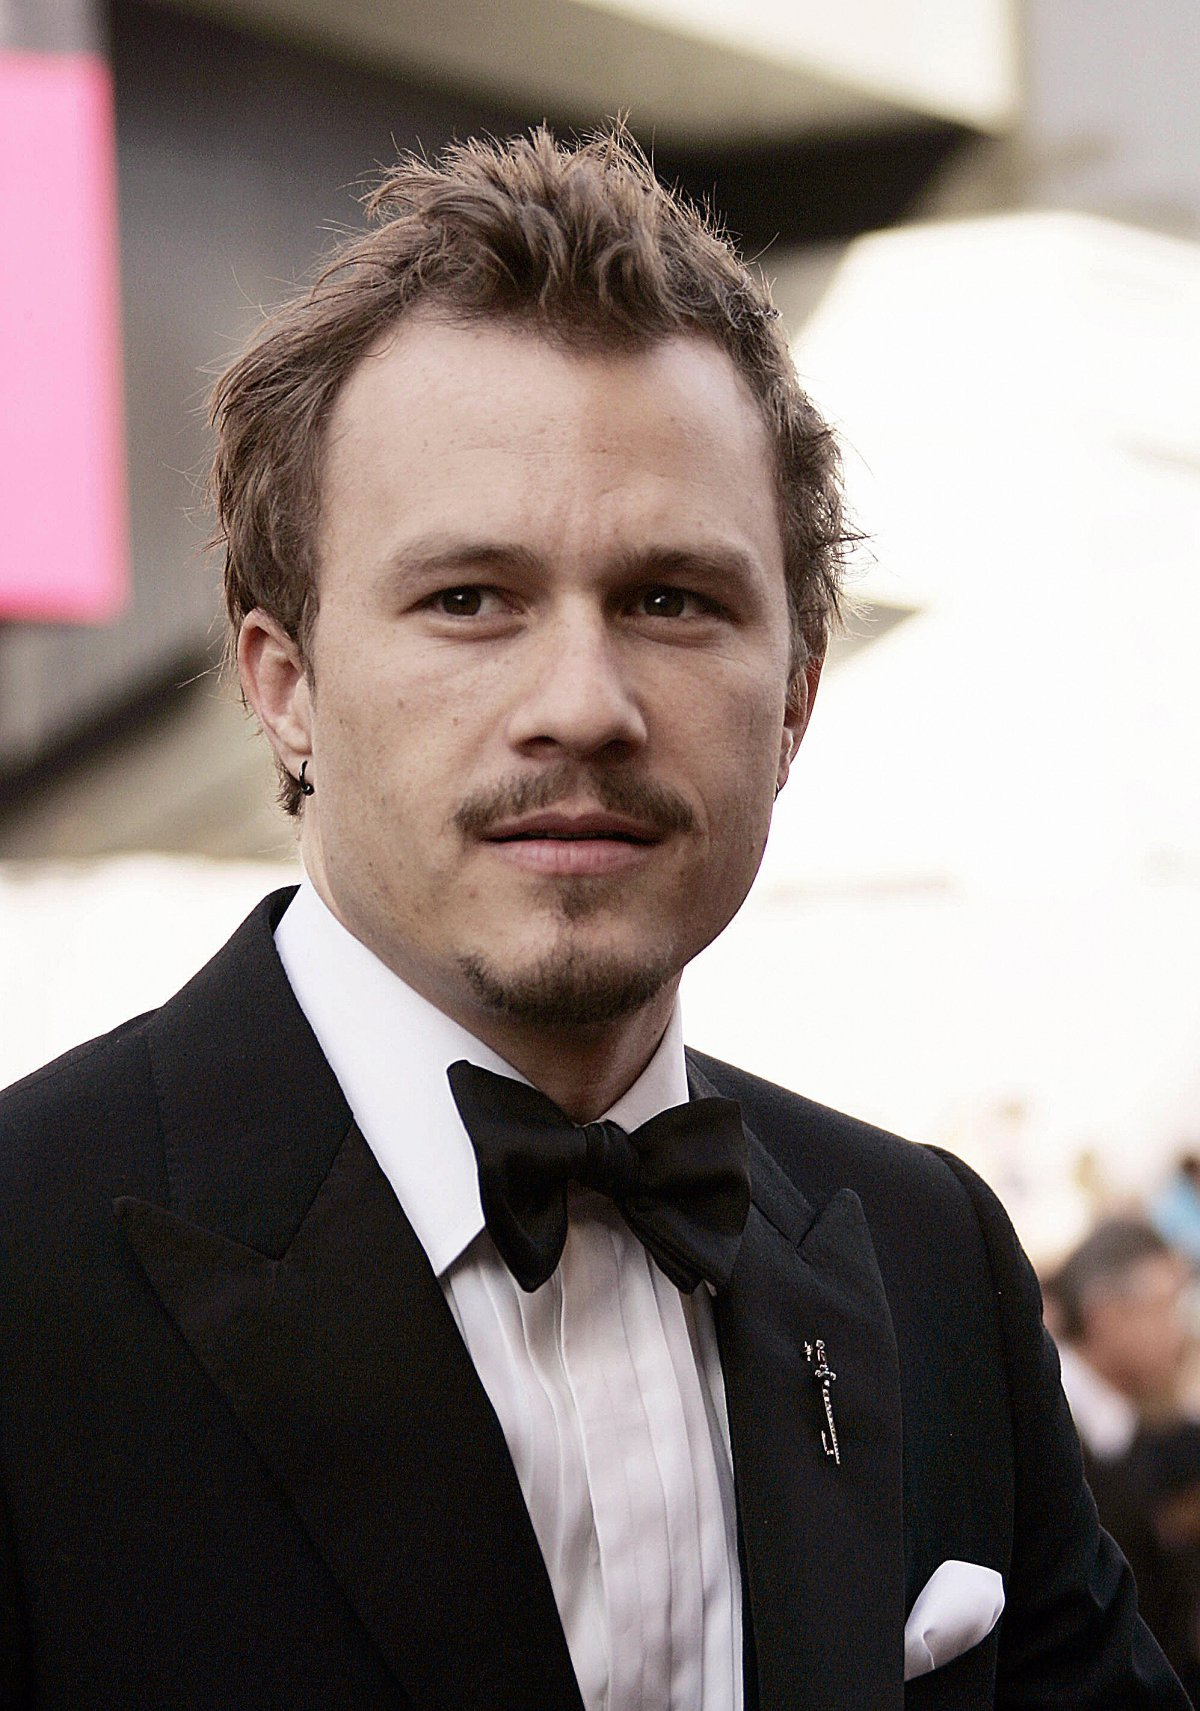 Heath Ledger (1979 – 2008) / Sobredosis